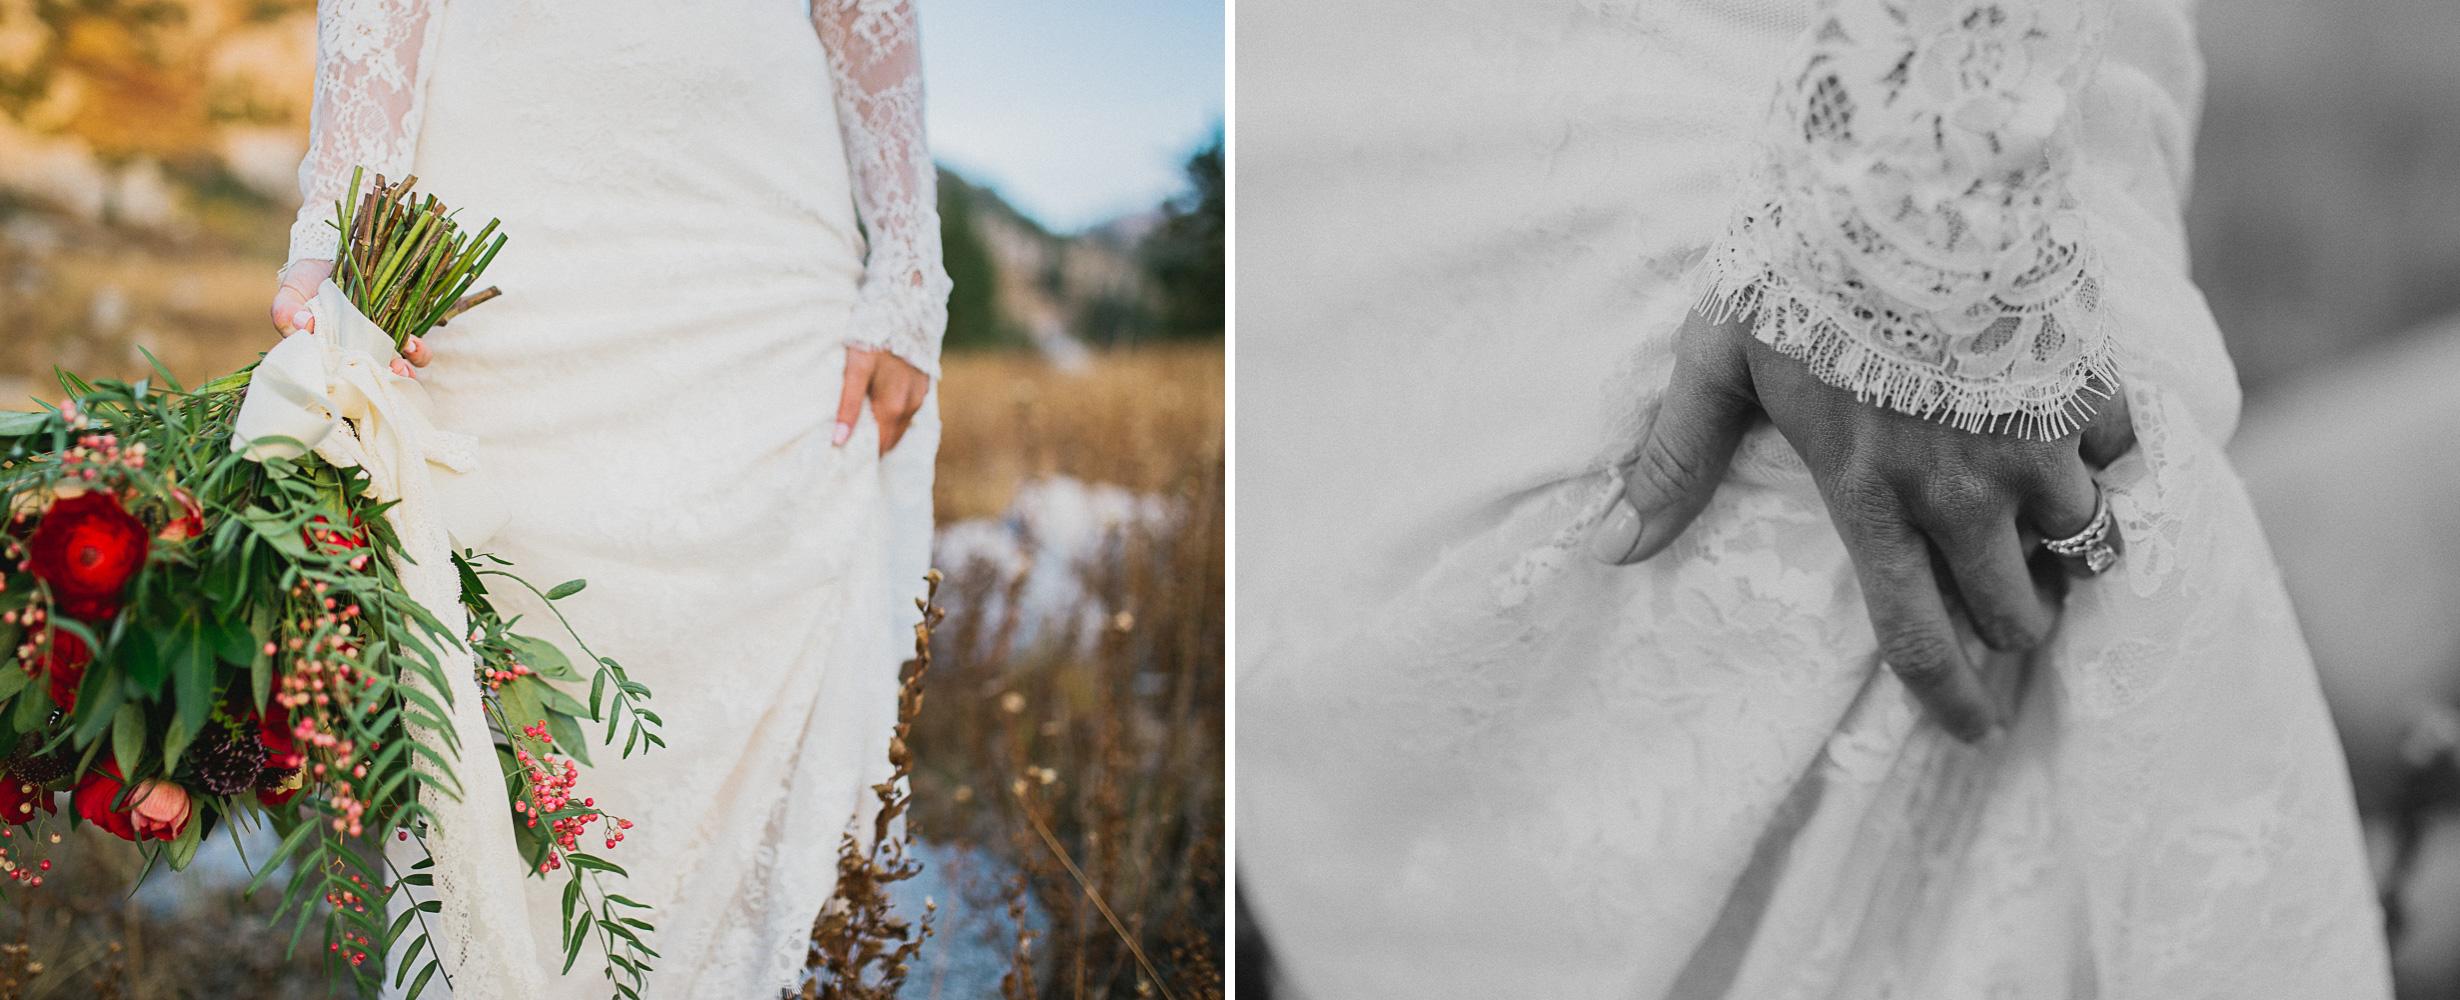 utah-wedding-photographer-salt-lake-city07.jpg